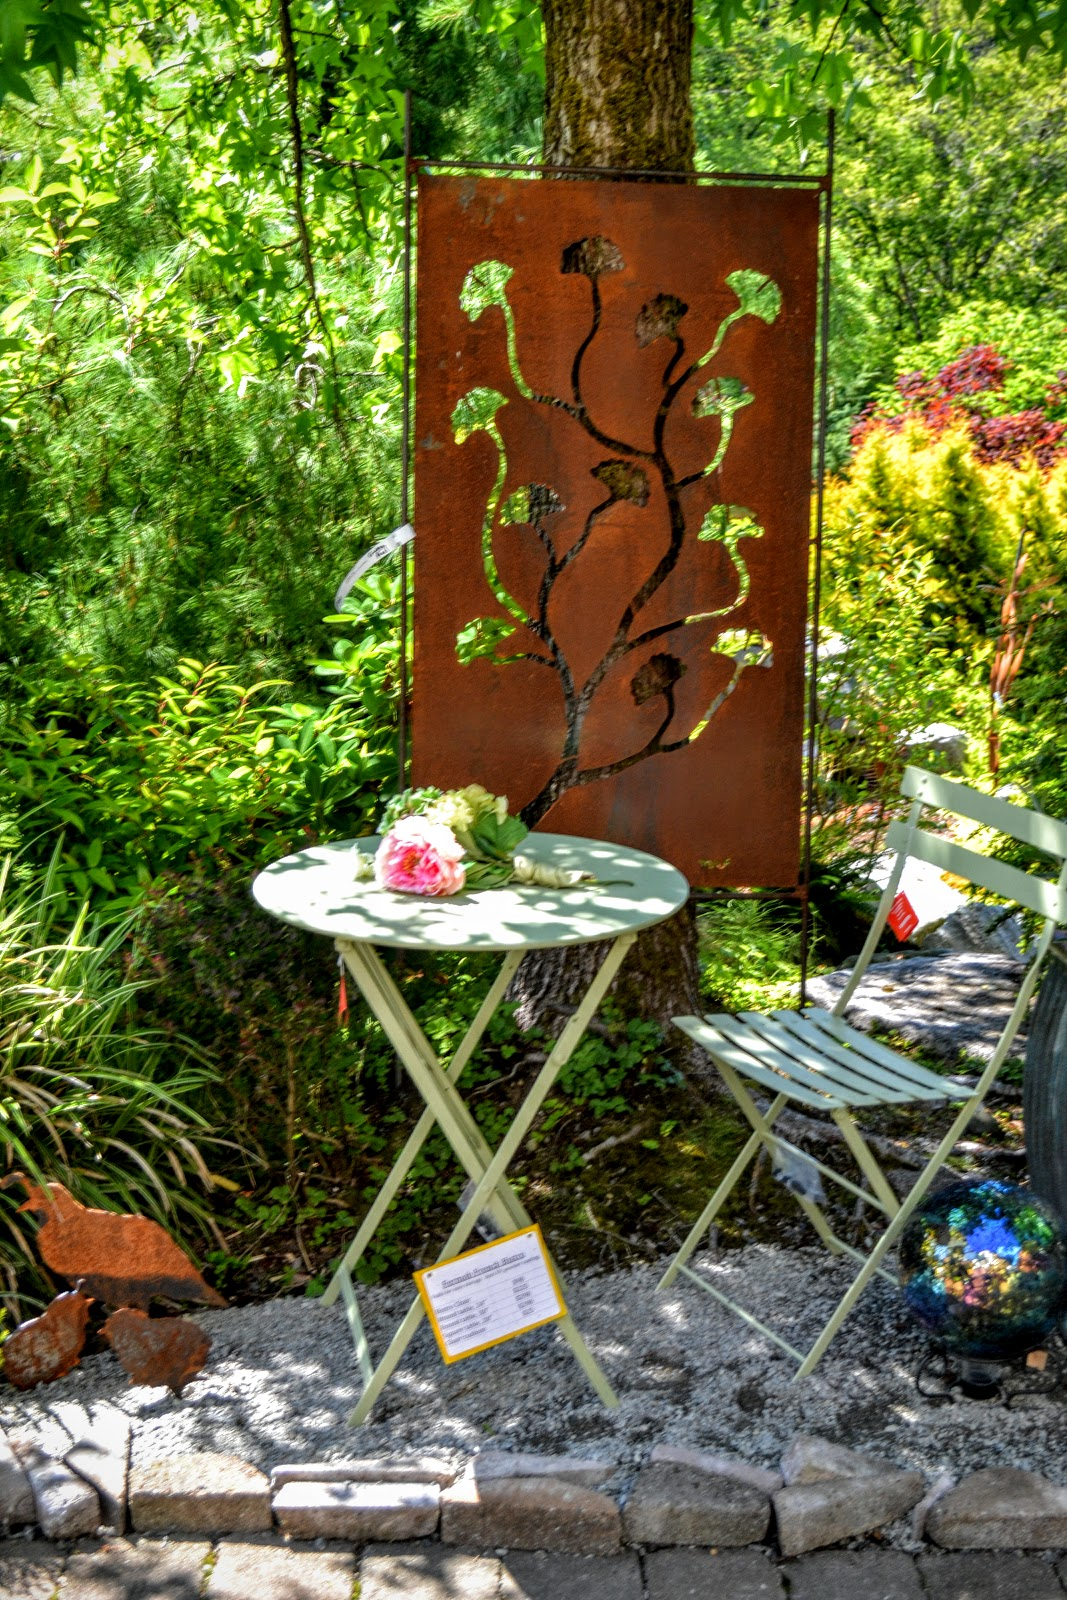 The Outlaw Gardener: Squak Mountain Greenhouses and Nursery